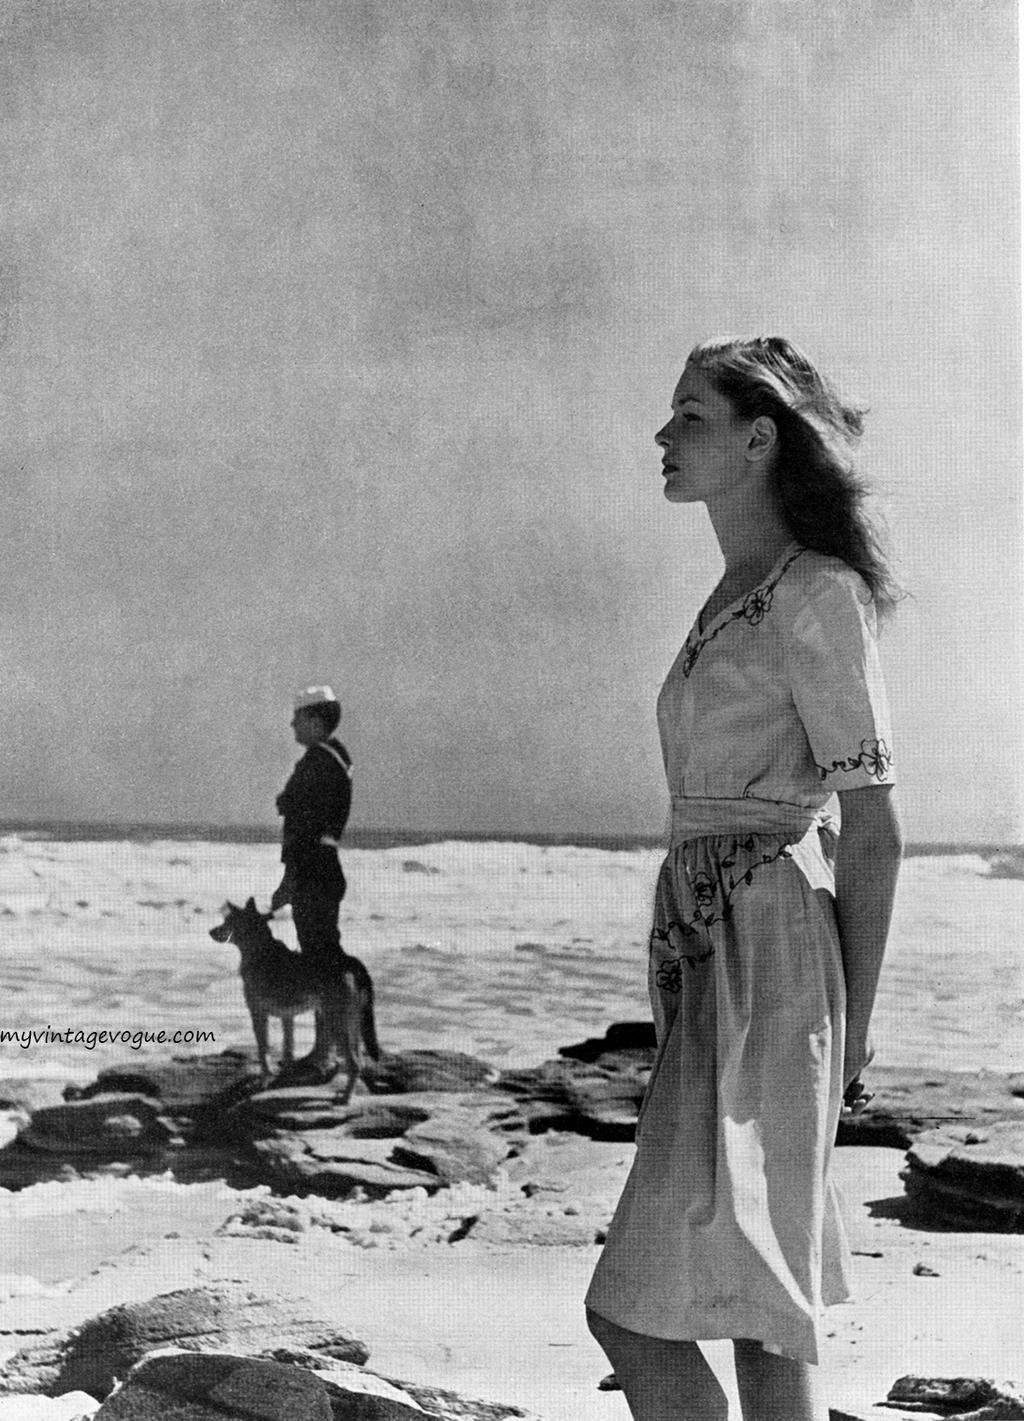 Fotó: Louise Dahl-Wolfe: Lauren Bacall, Harper's Bazaar, May 1943 © Louise Dahl-Wolfe